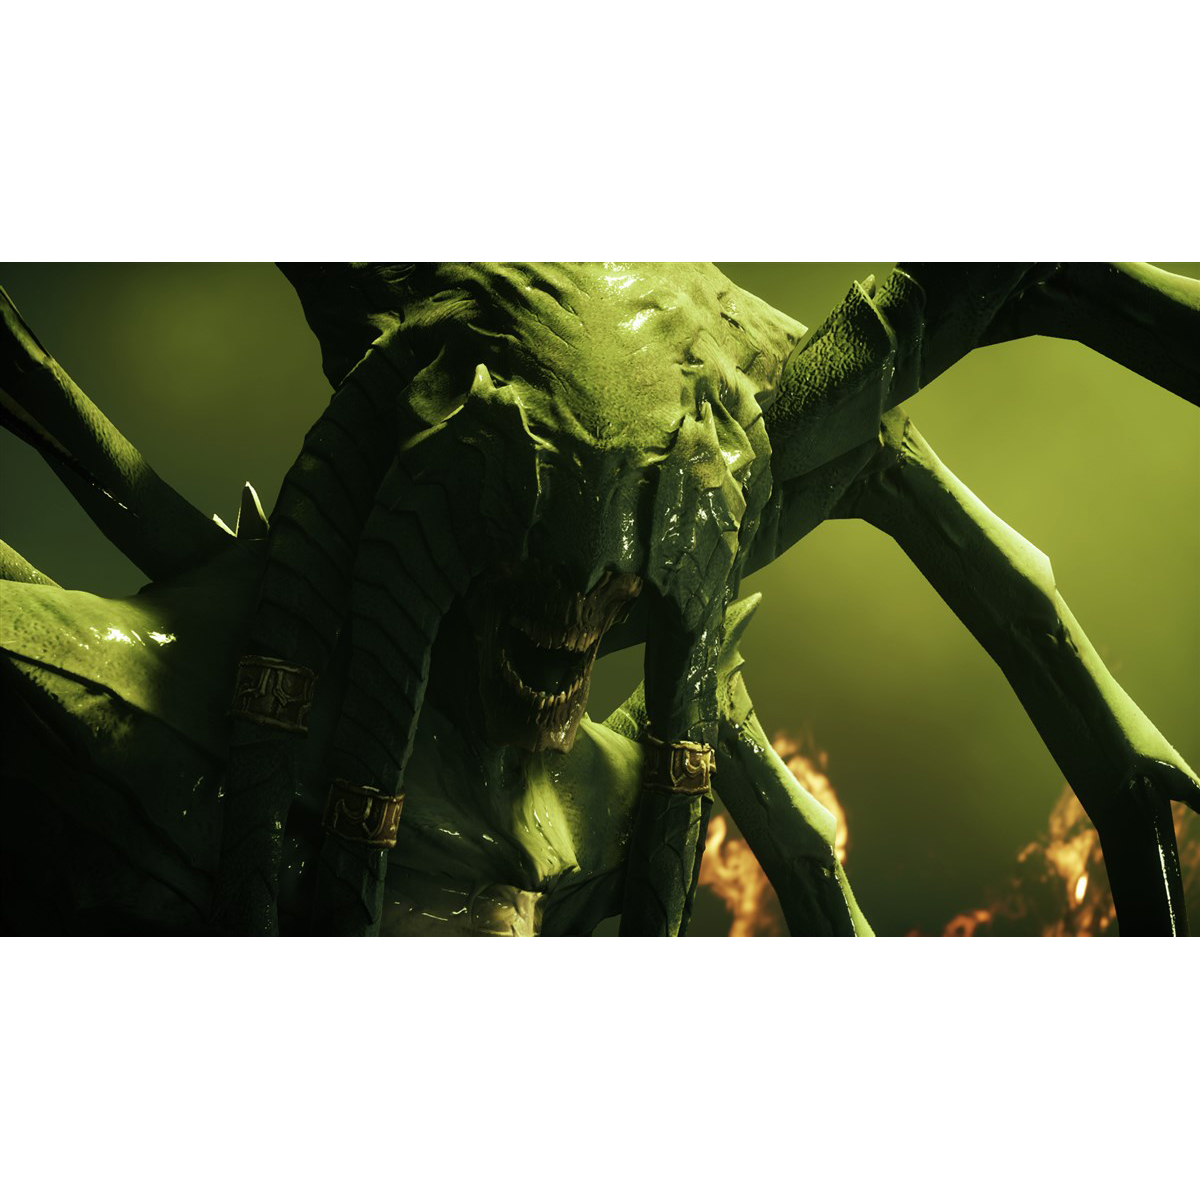 Joc Dragon Age: Inquisition pentru PlayStation 3 10